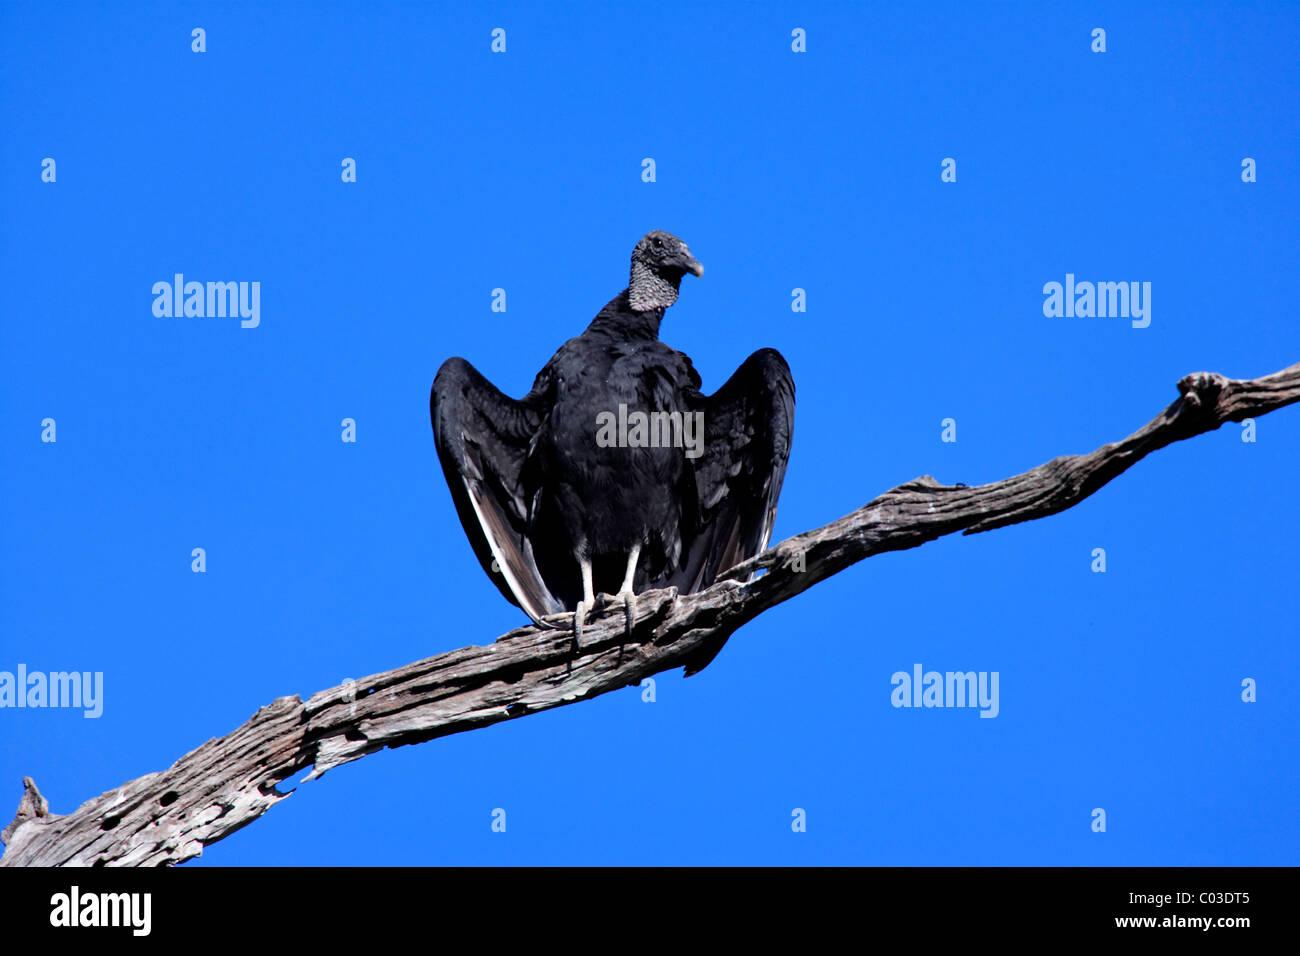 Mönchsgeier (Coragyps Atratus), Erwachsene auf Baum, Pantanal, Brasilien, Südamerika Stockbild